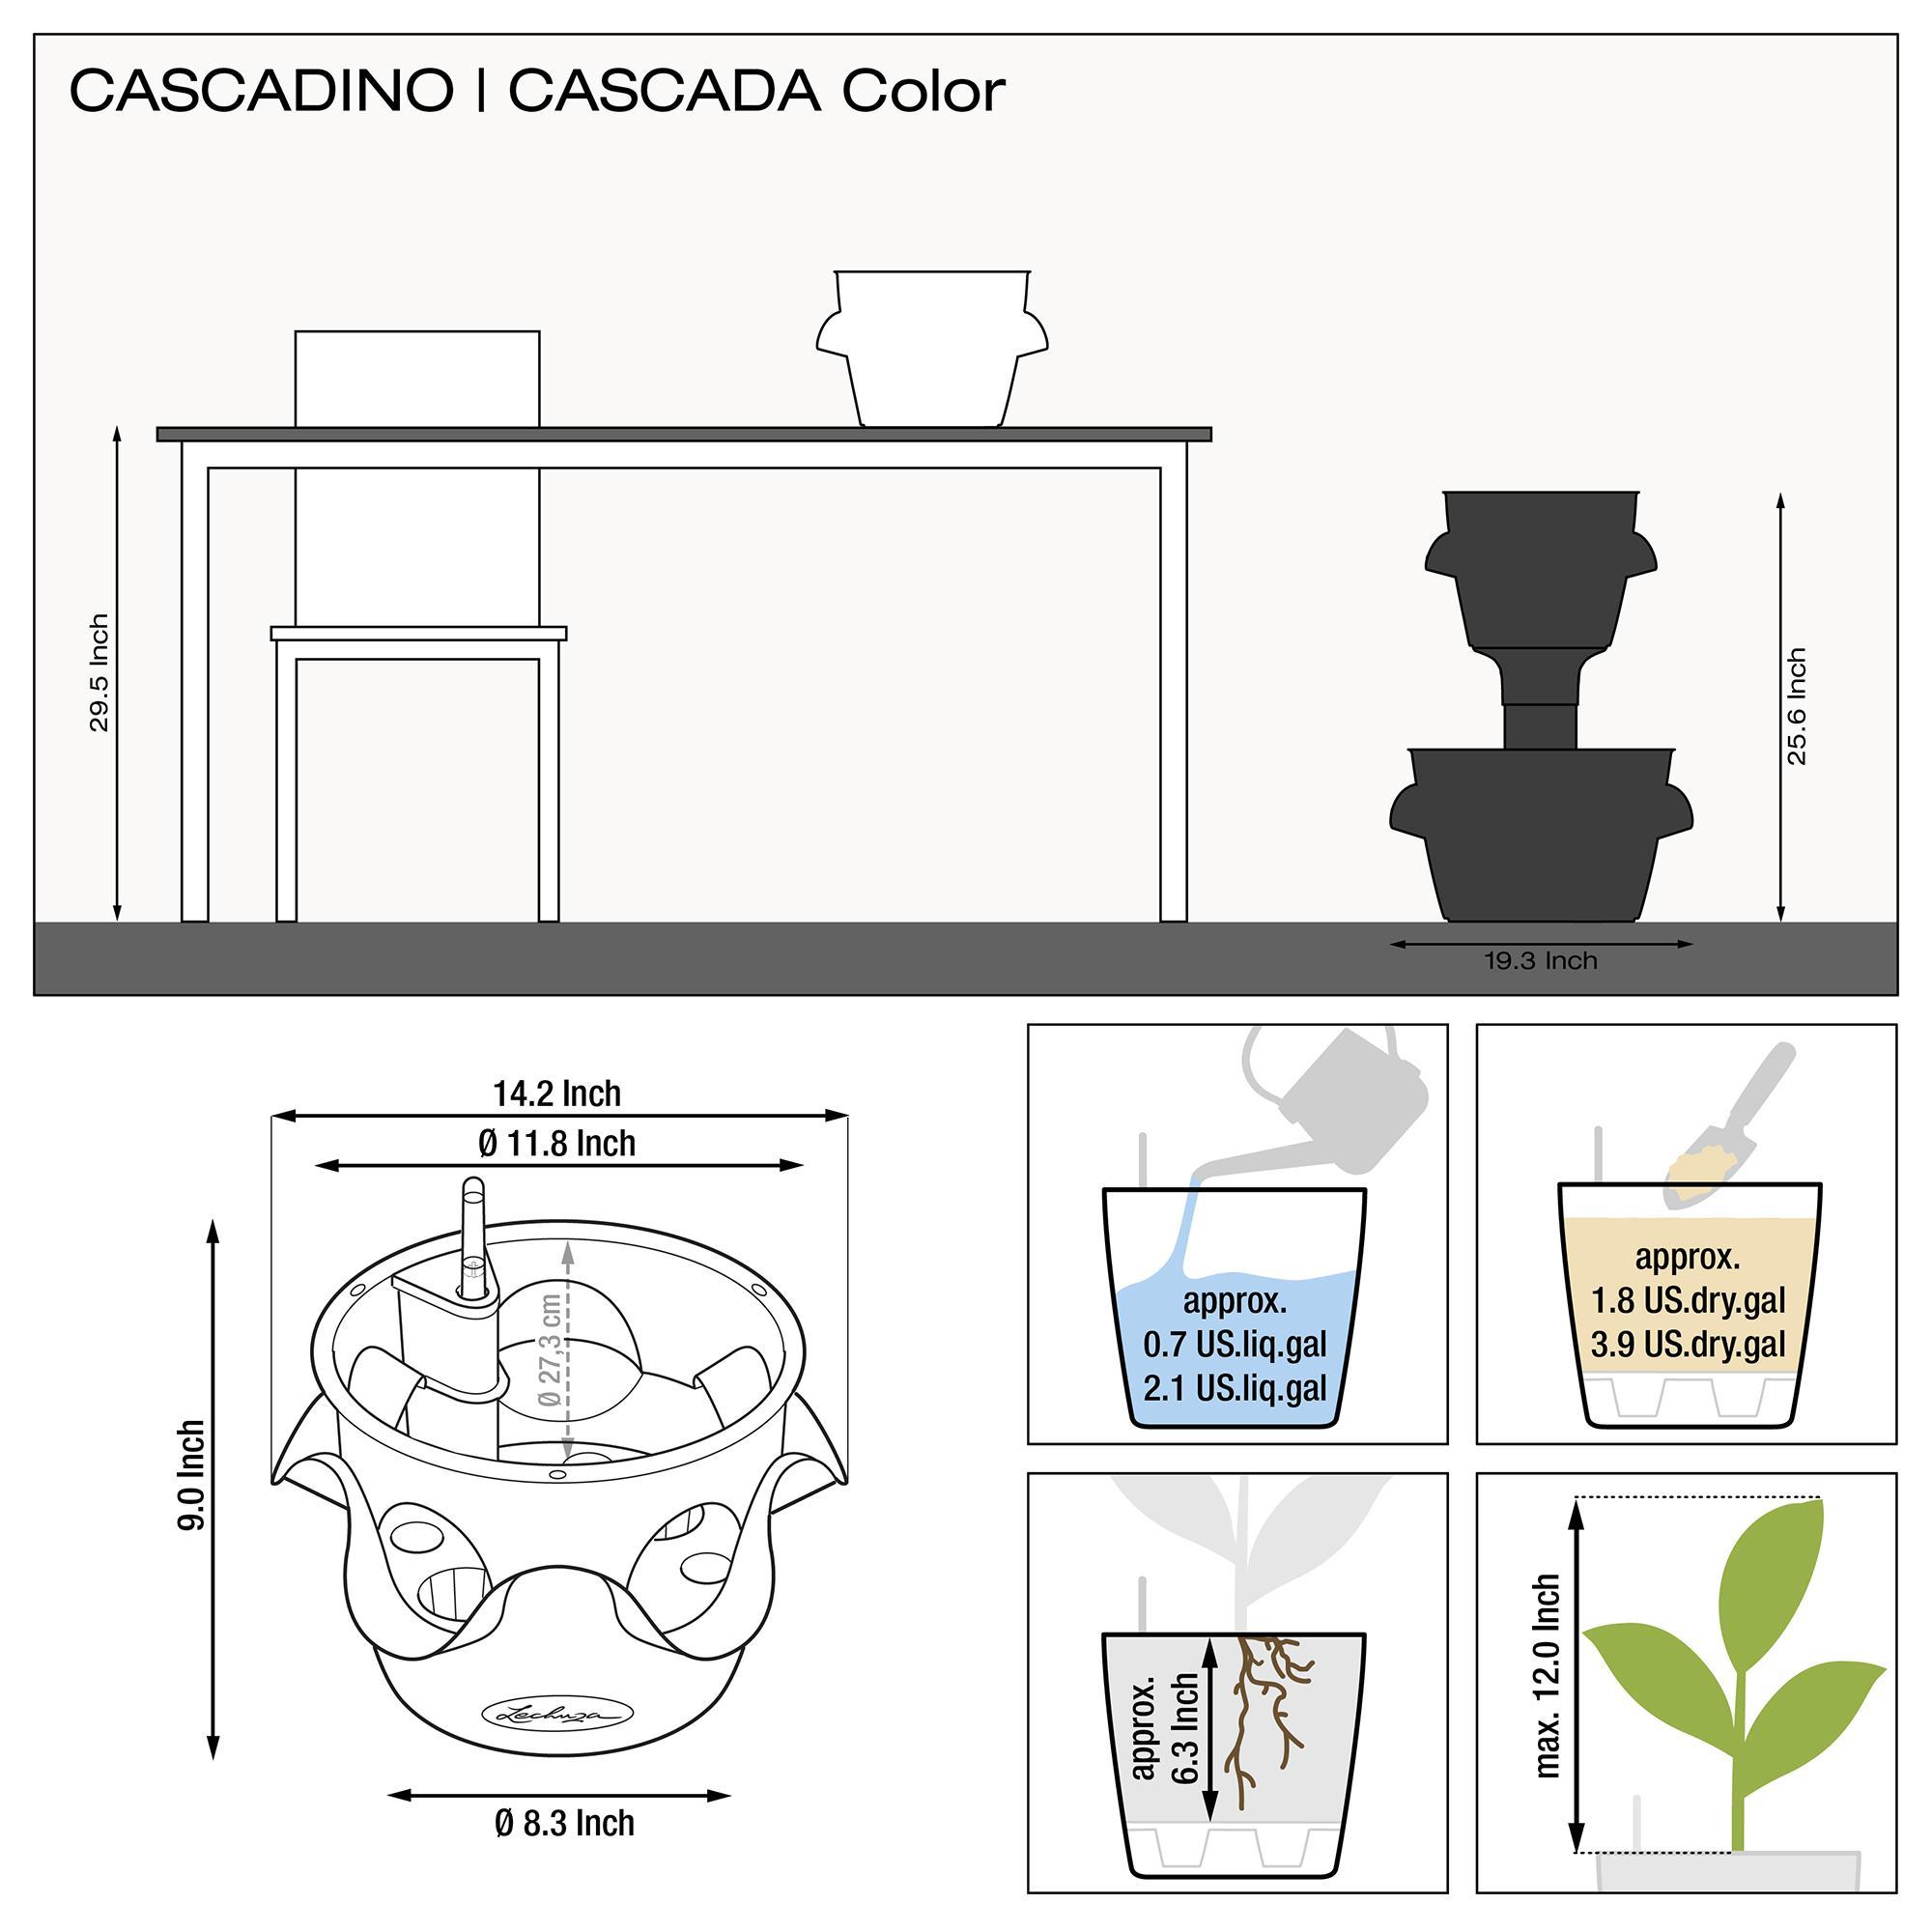 le_cascadino-color36-2_product_addi_nz_us